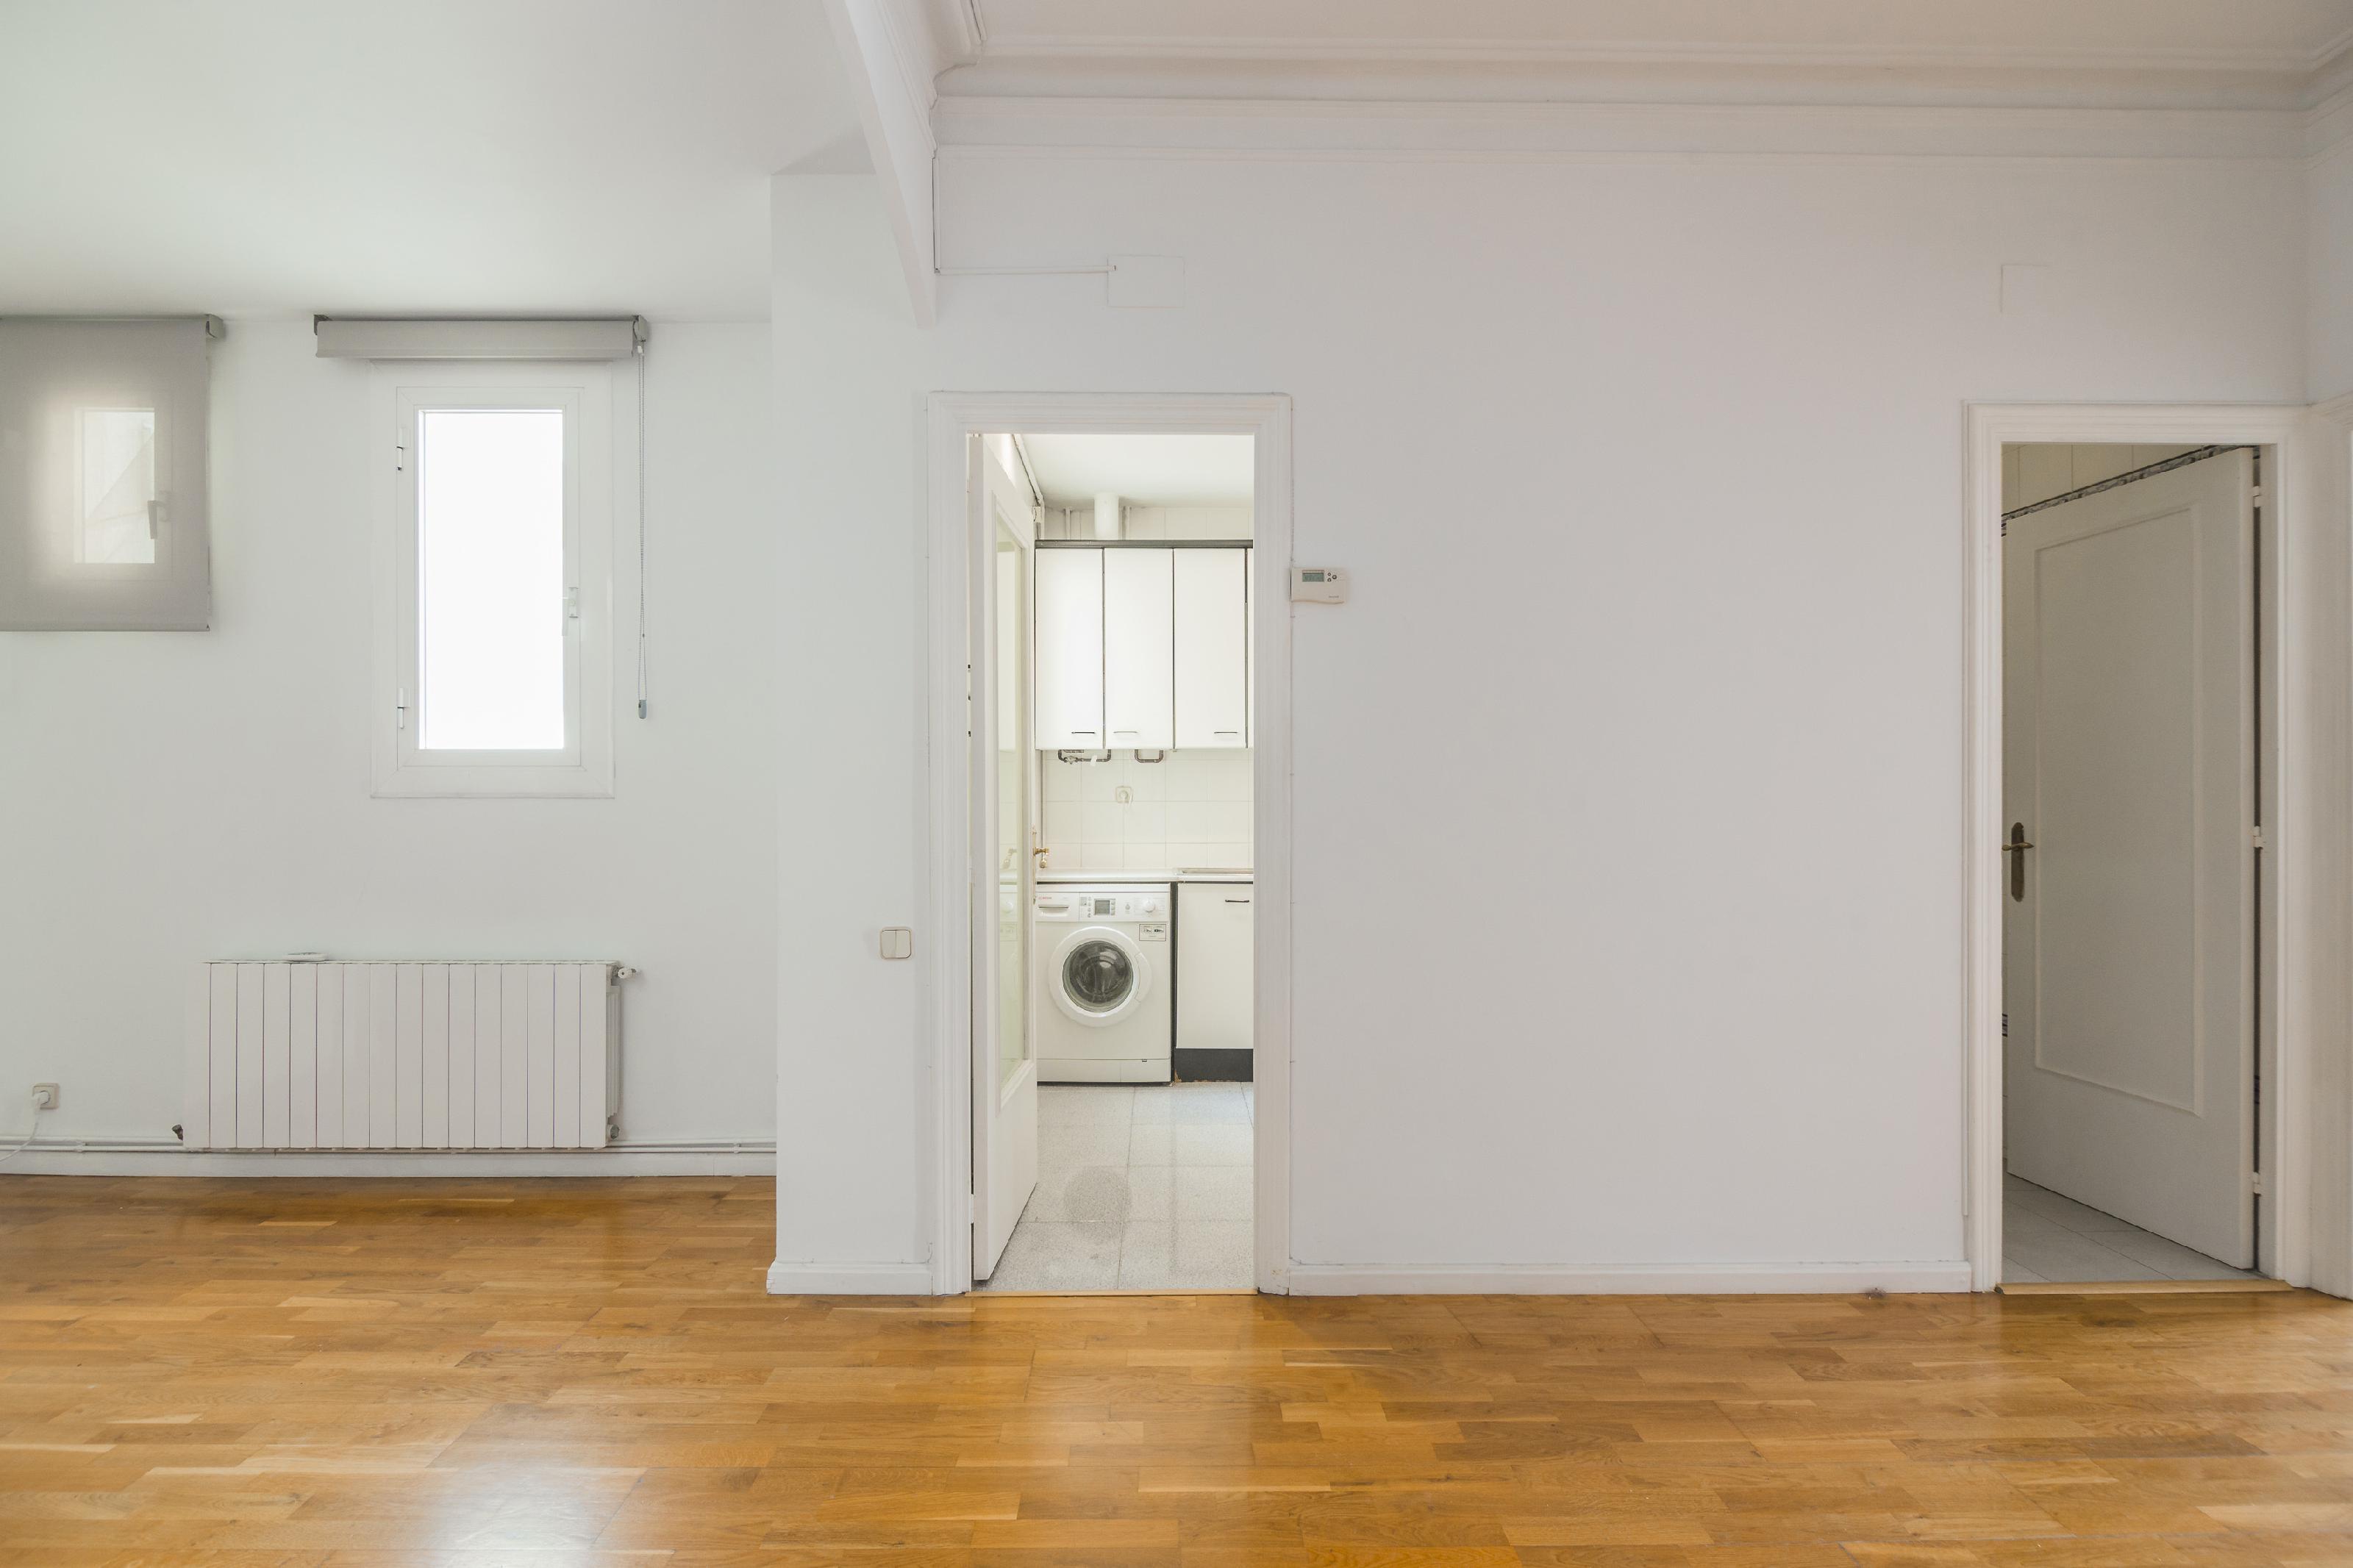 246907 Flat for sale in Eixample, Nova Esquerra Eixample 6